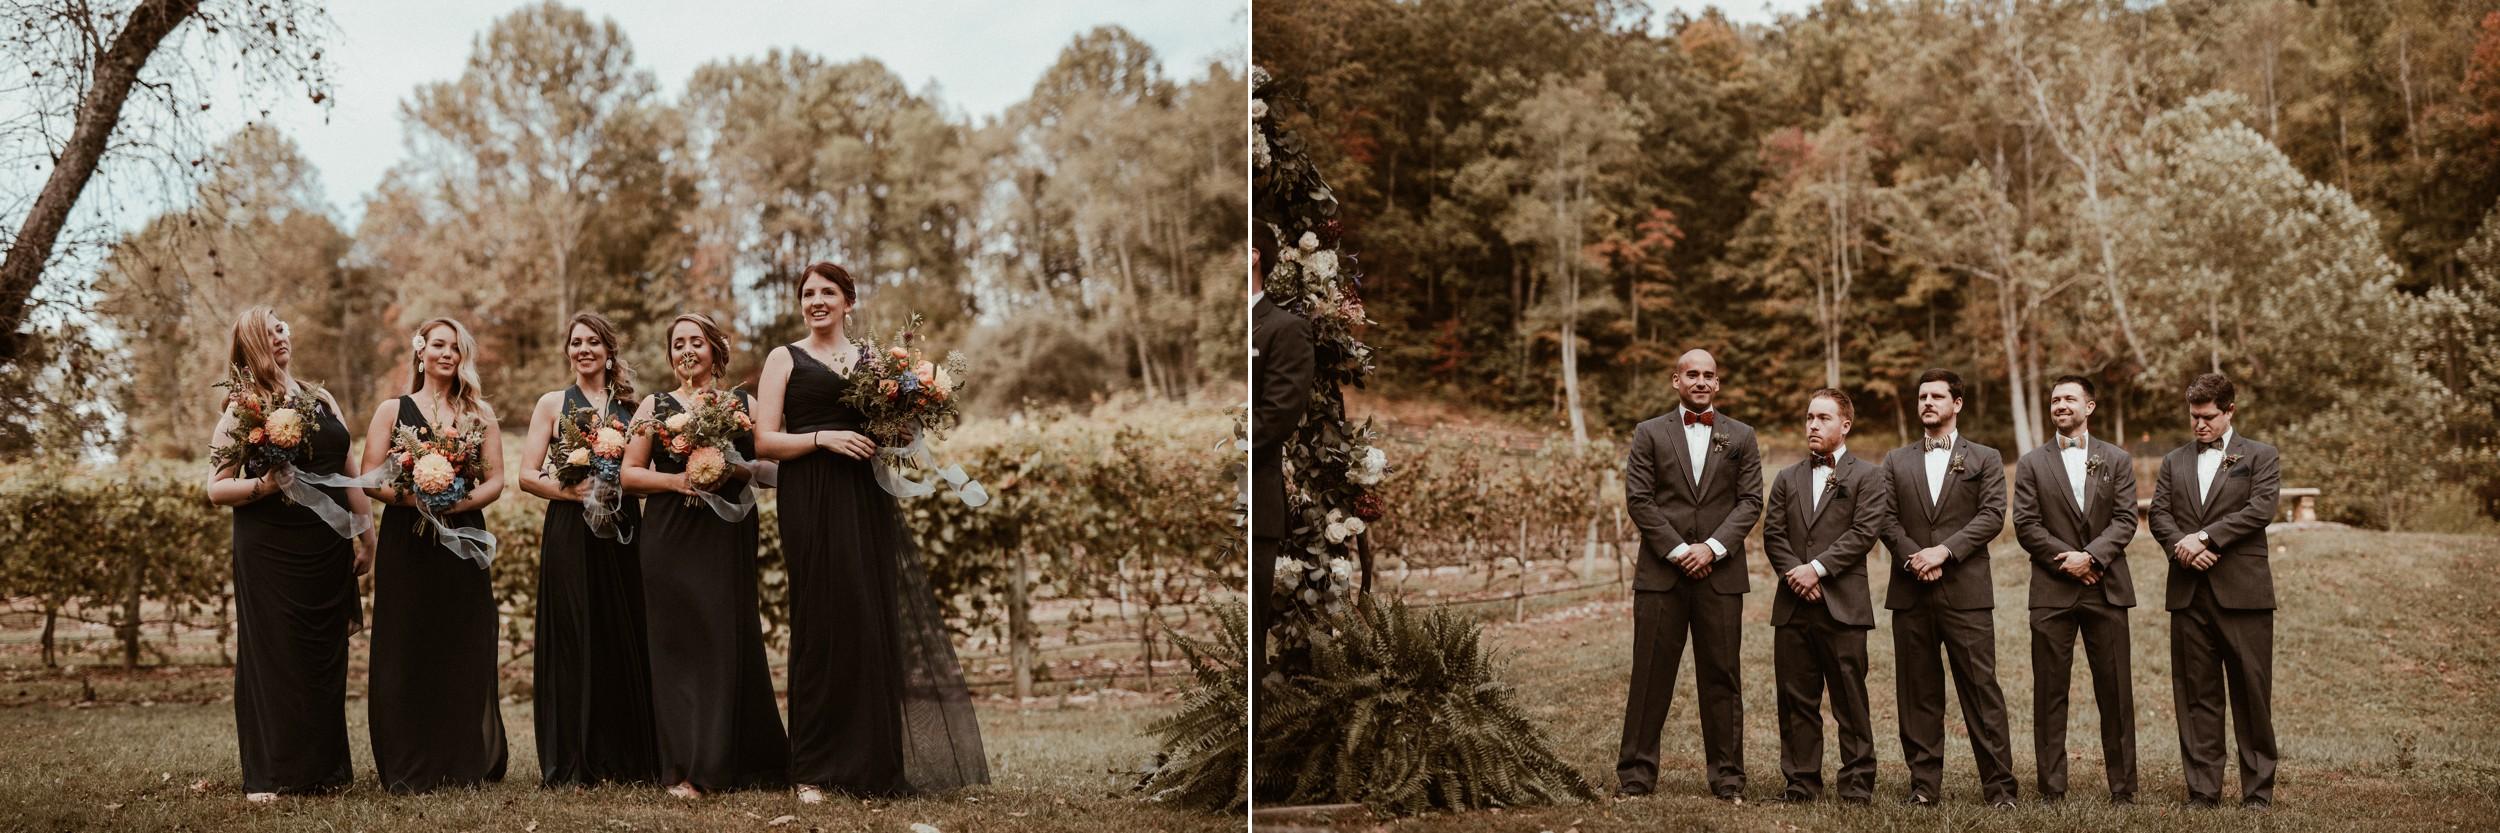 north-carolina-fall-vineyard-wedding-vanessaalvesphotography-65.jpg